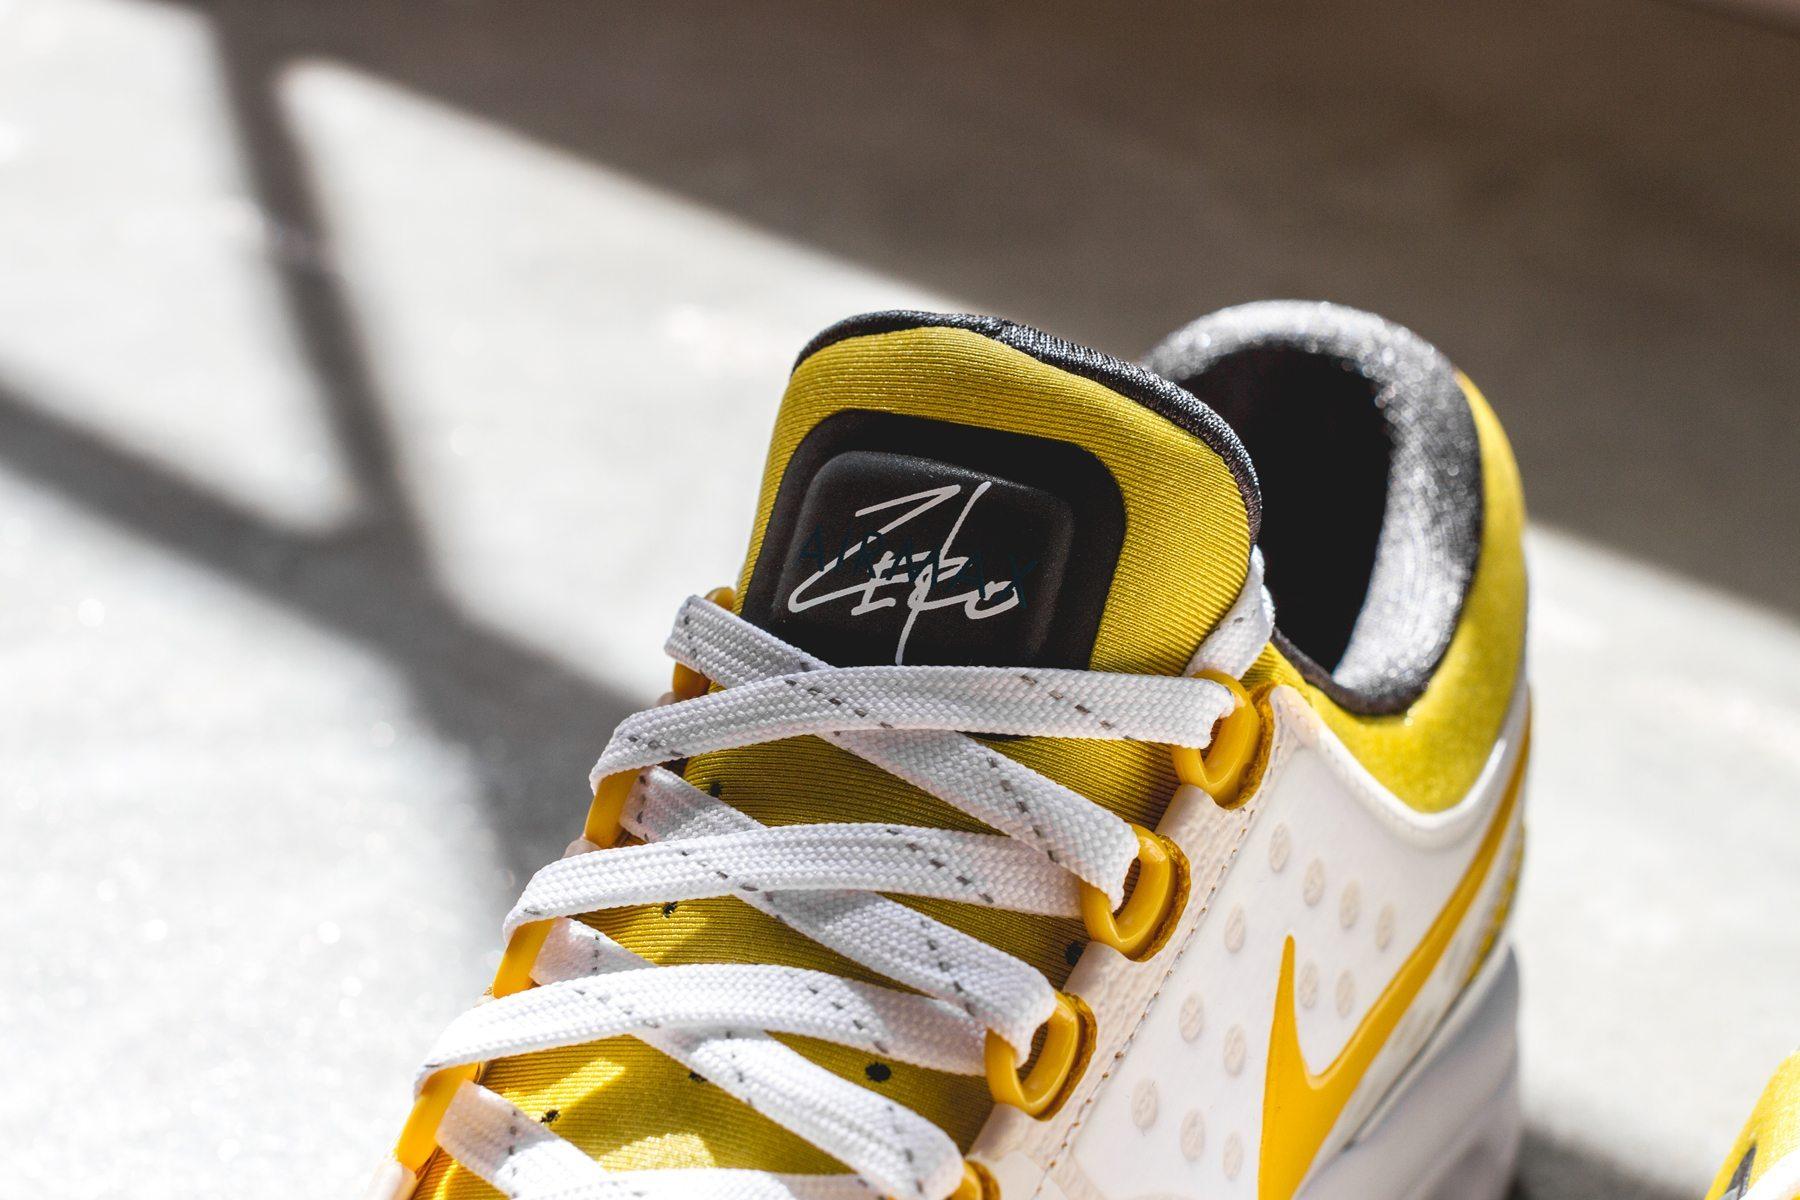 Nike Air Max Zero Tinker Hatfield 4